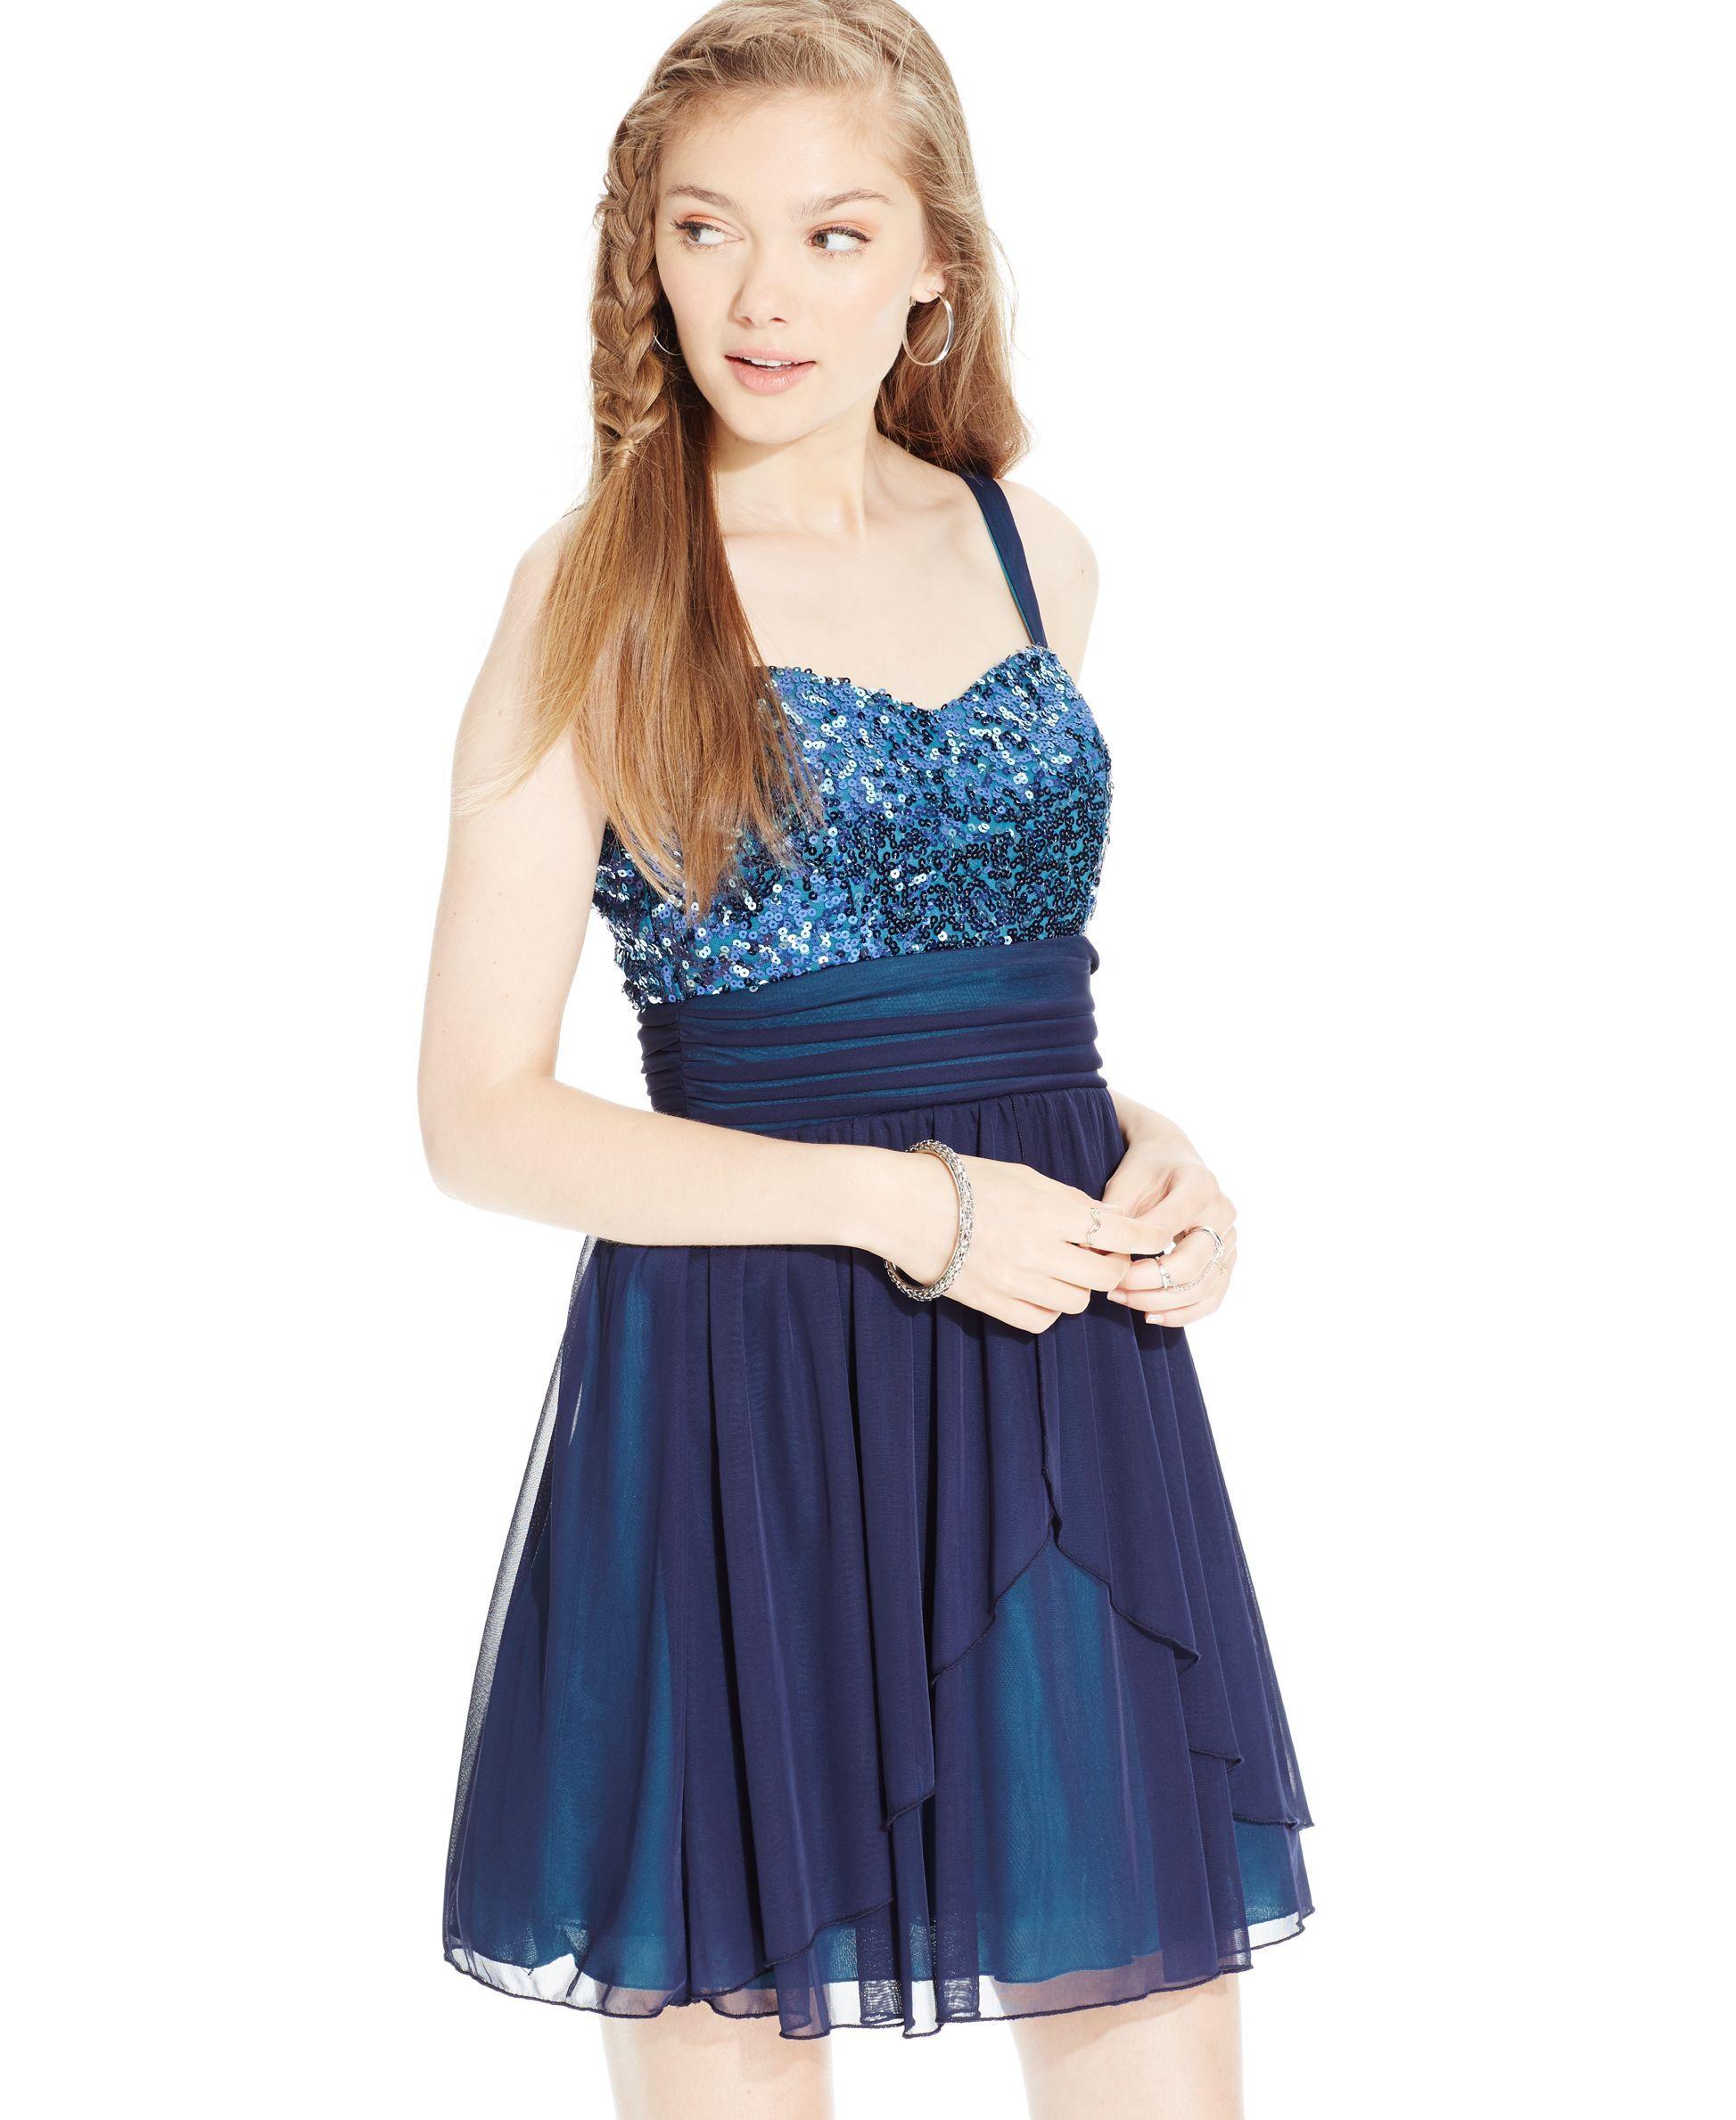 Speechless Juniors\' Sequin-Embellished Chiffon Party Dress - Juniors ...